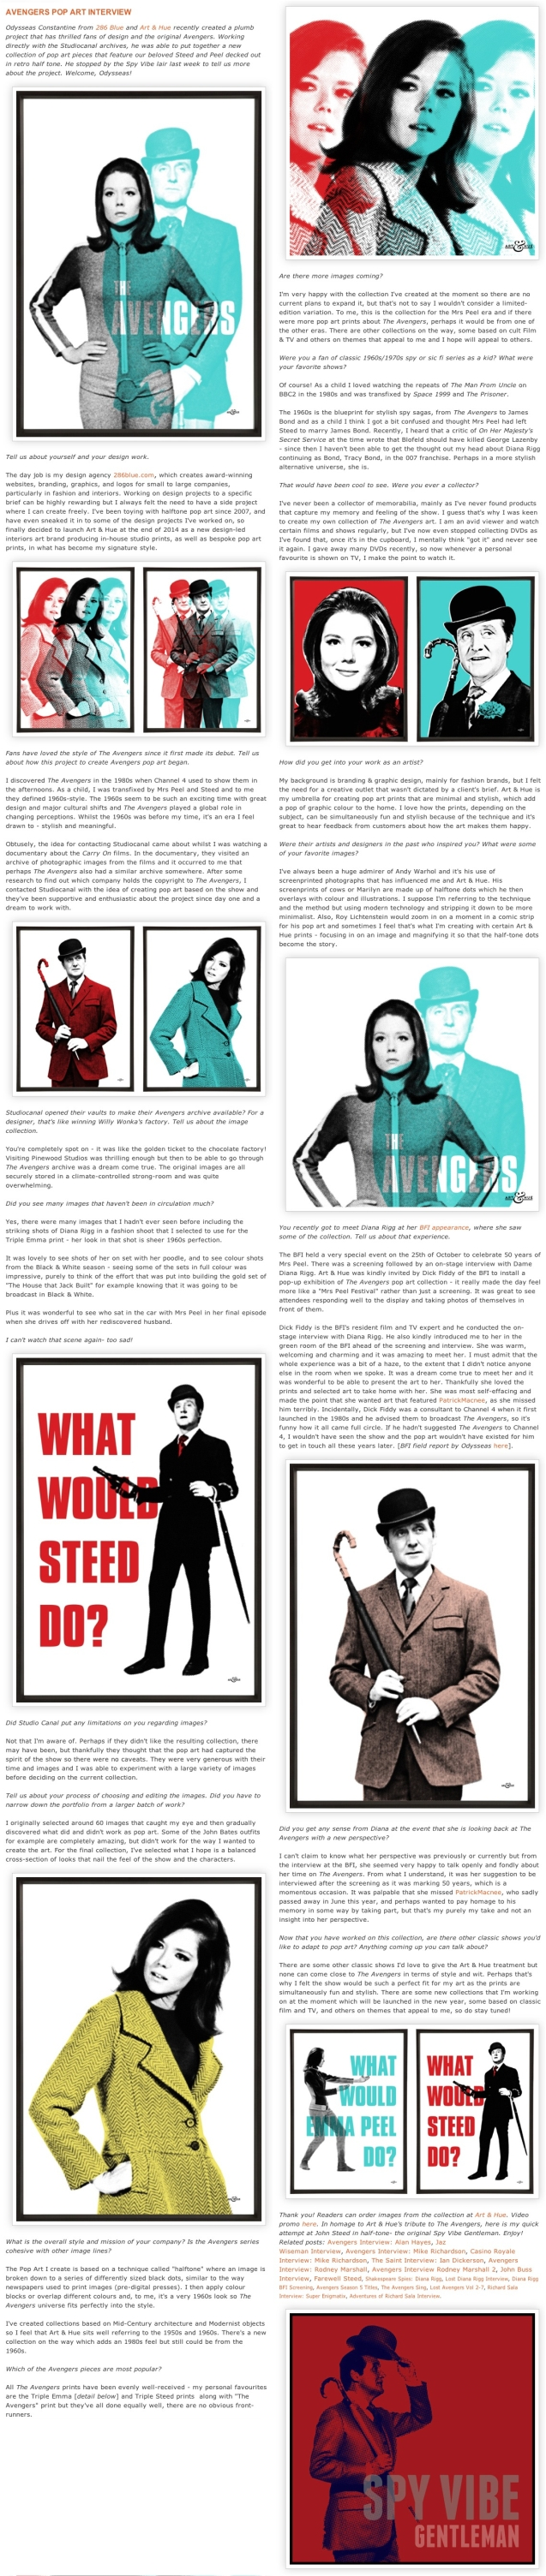 Spy Vibe Interview